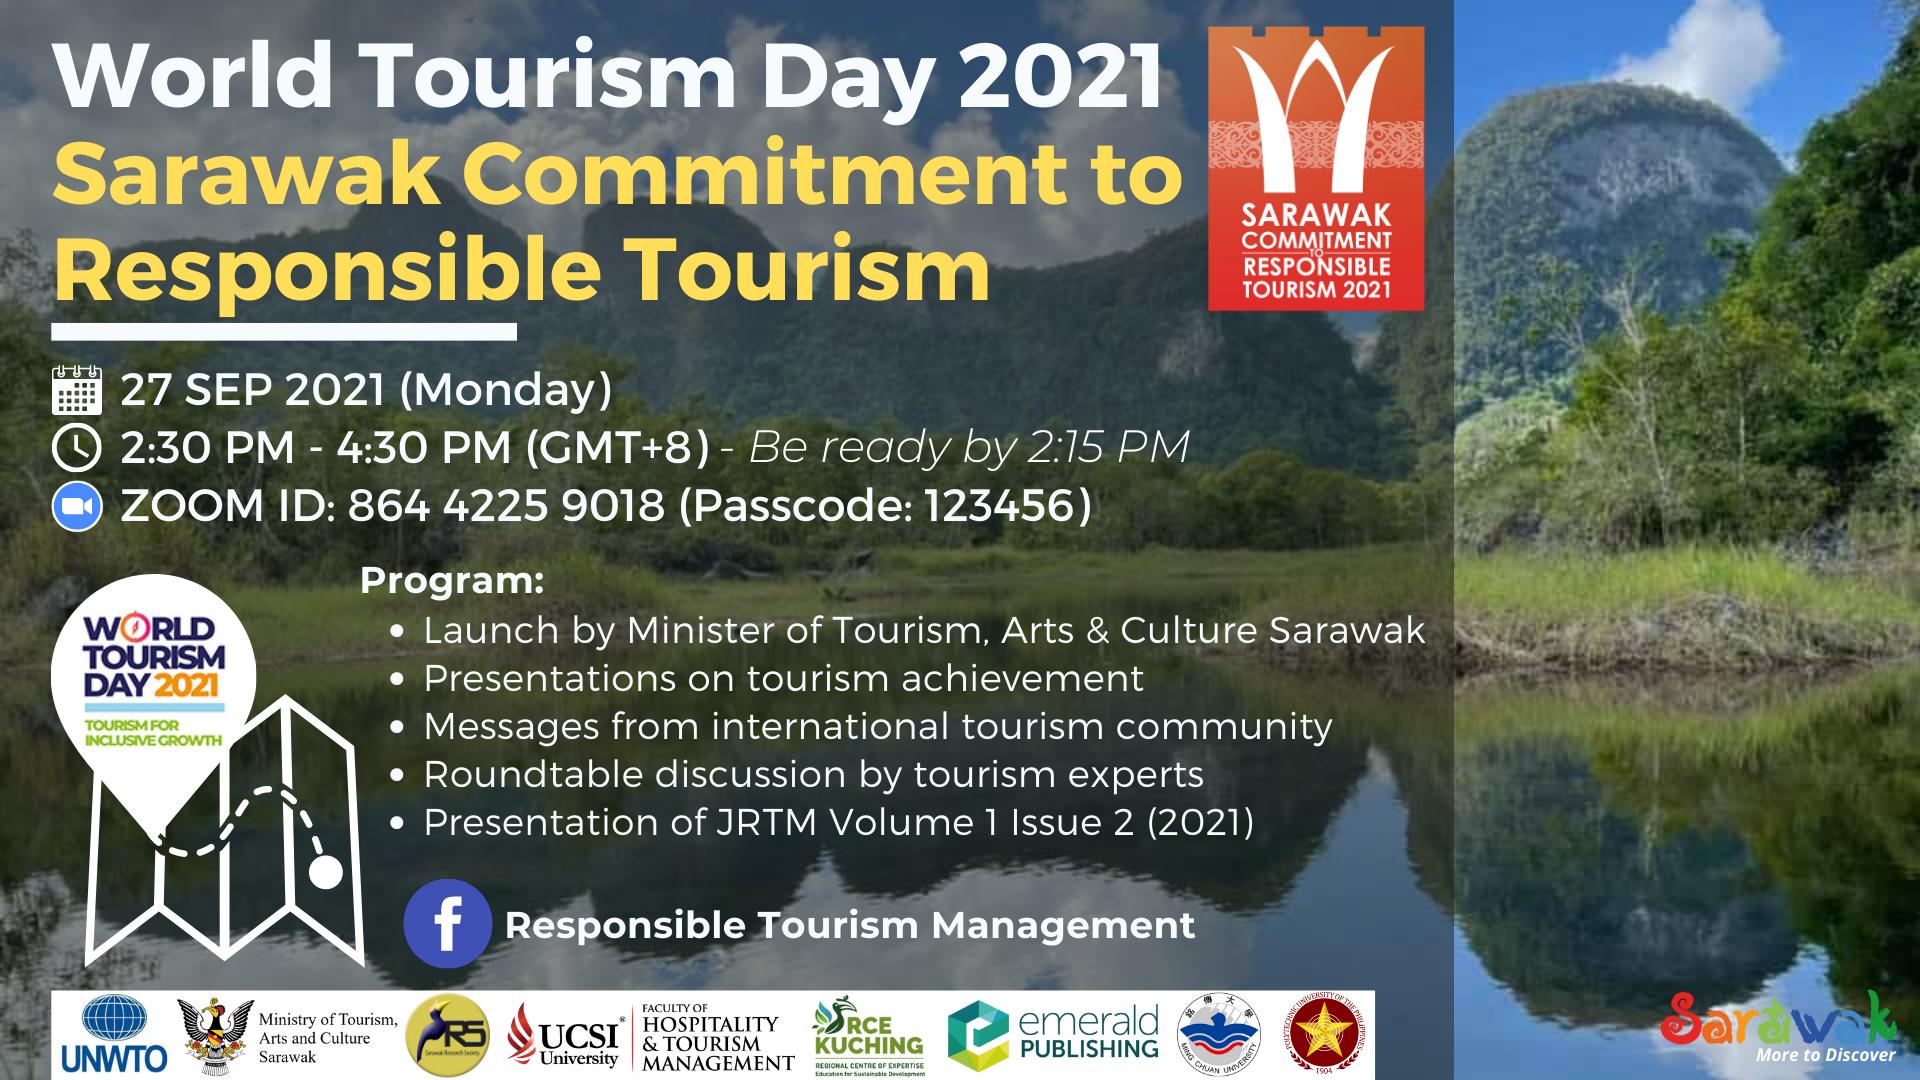 World Tourism Day 2021 - Sarawak Commitment to Responsible Tourism